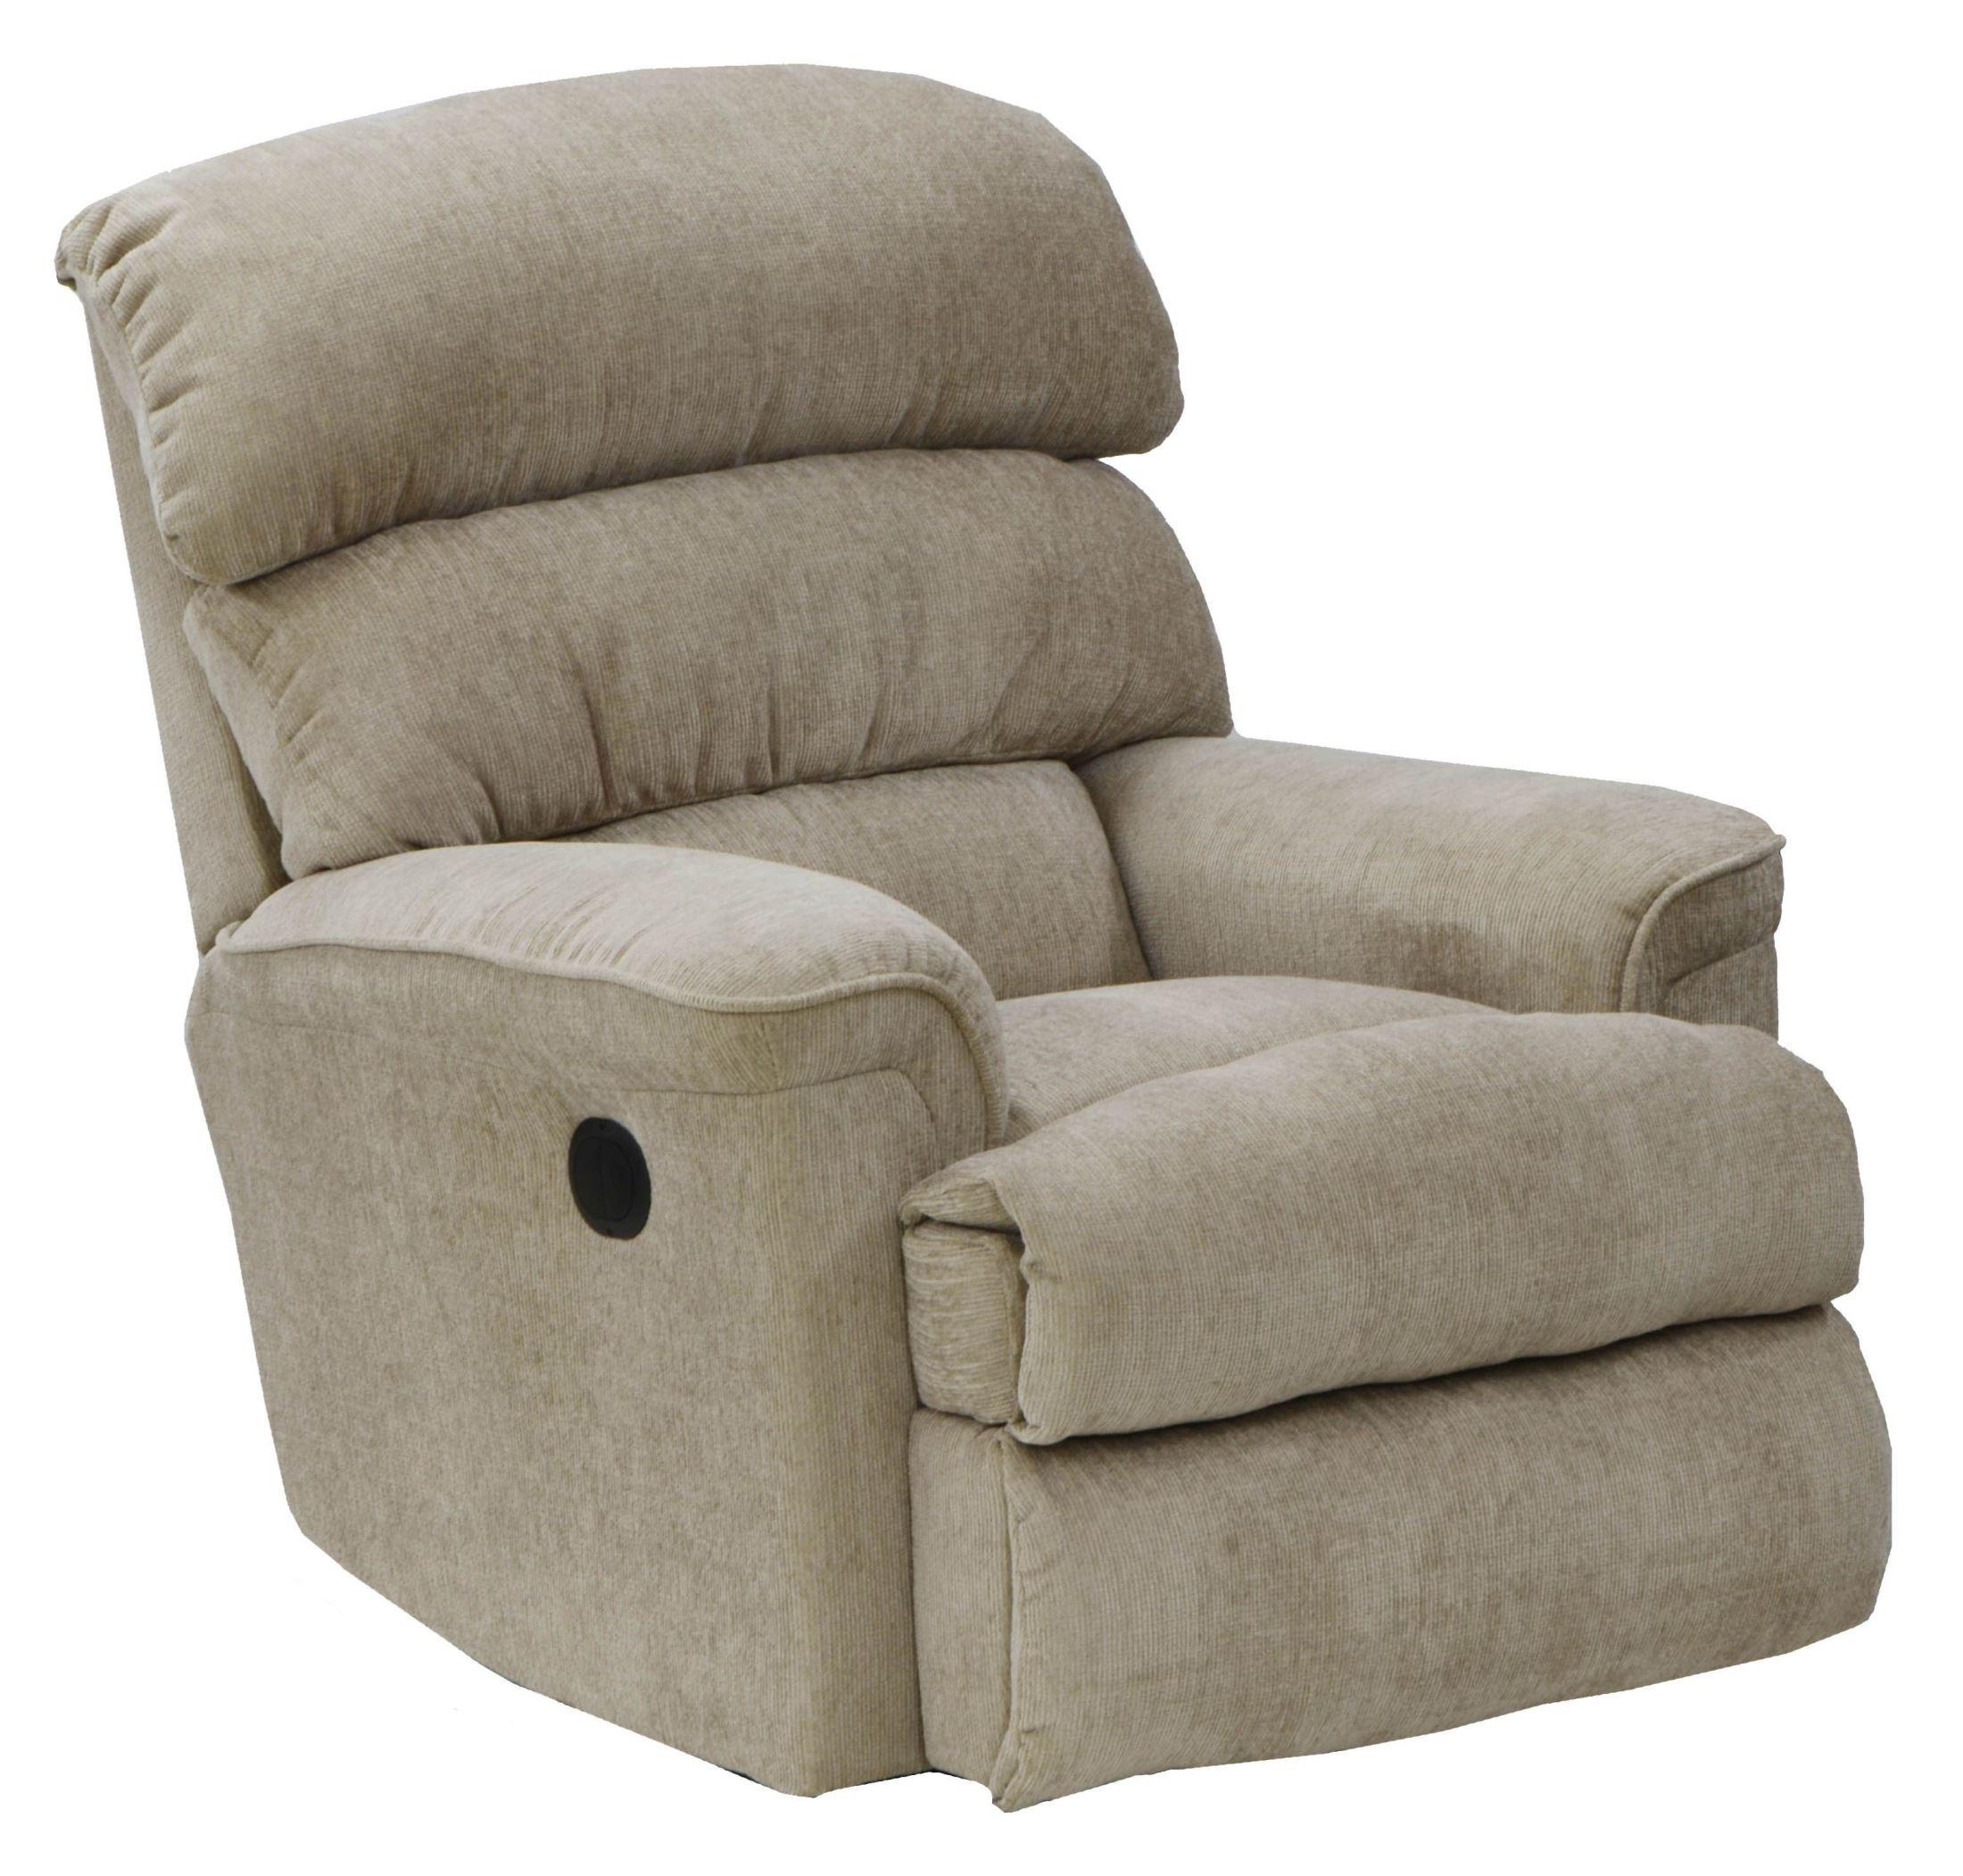 Pearson linen rocker recliner from catnapper 47392179301 for Catnapper cloud nine chaise recliner